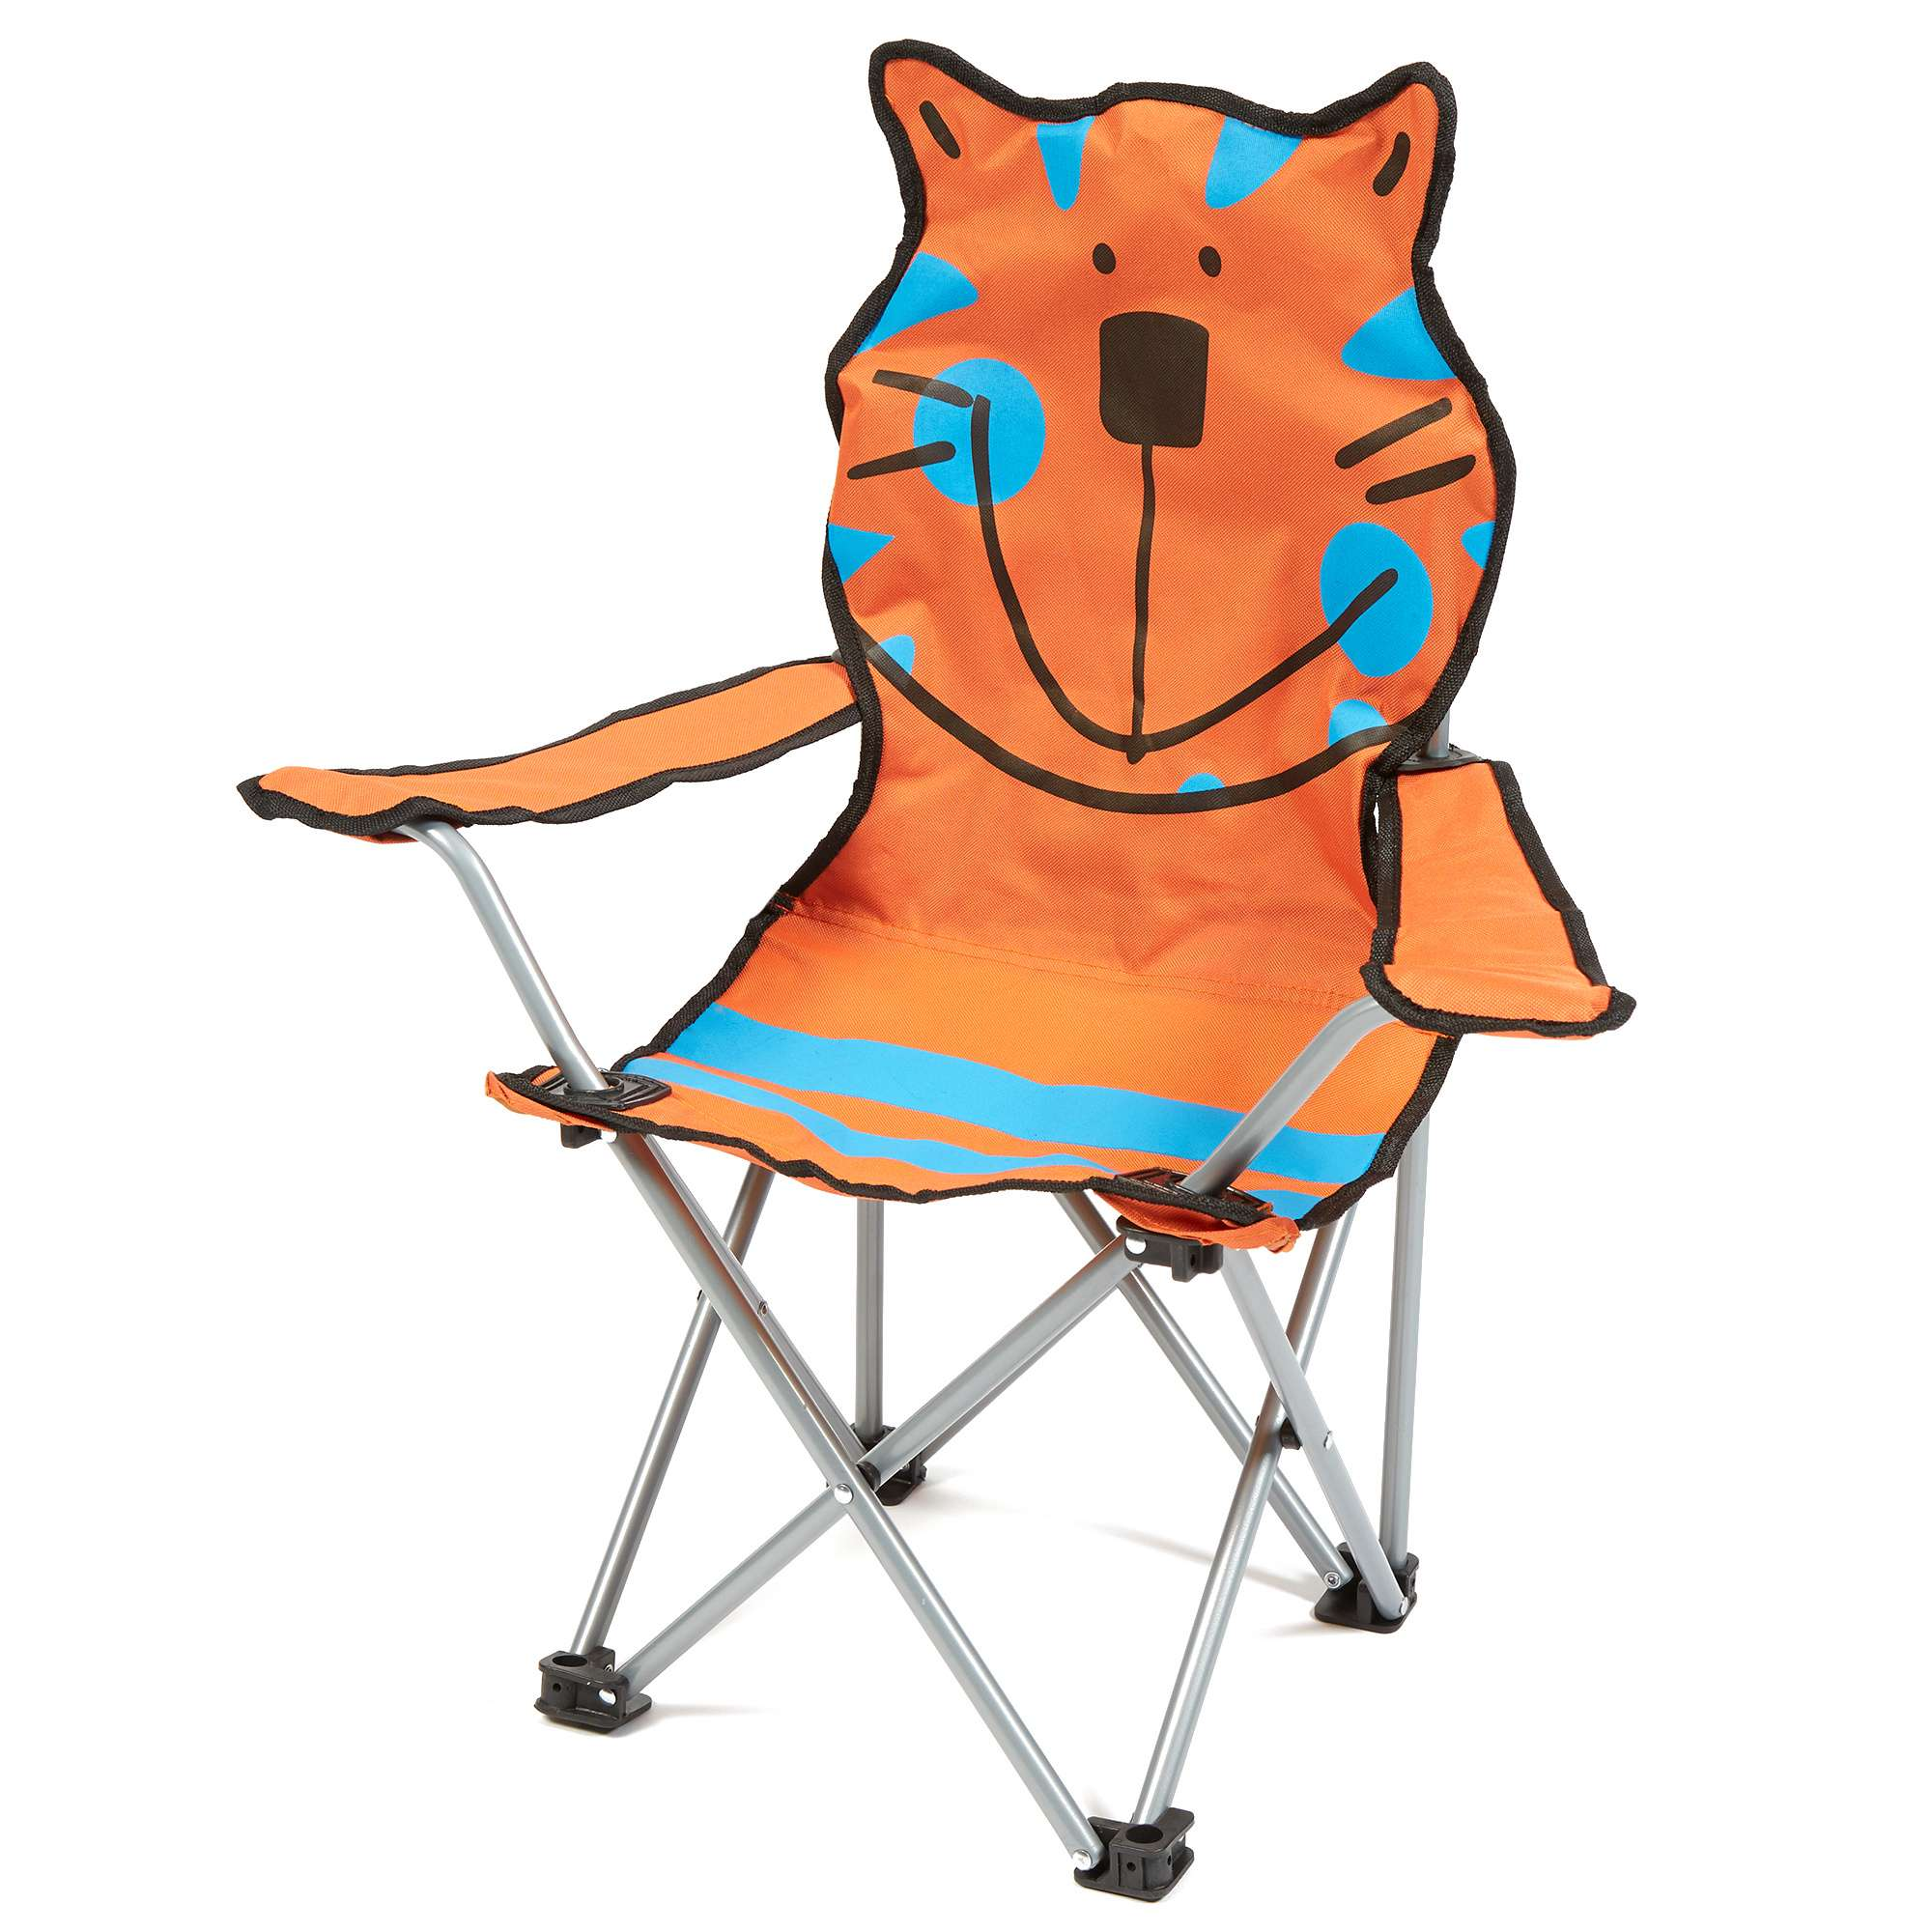 EUROHIKE Kids' Tiger Chair